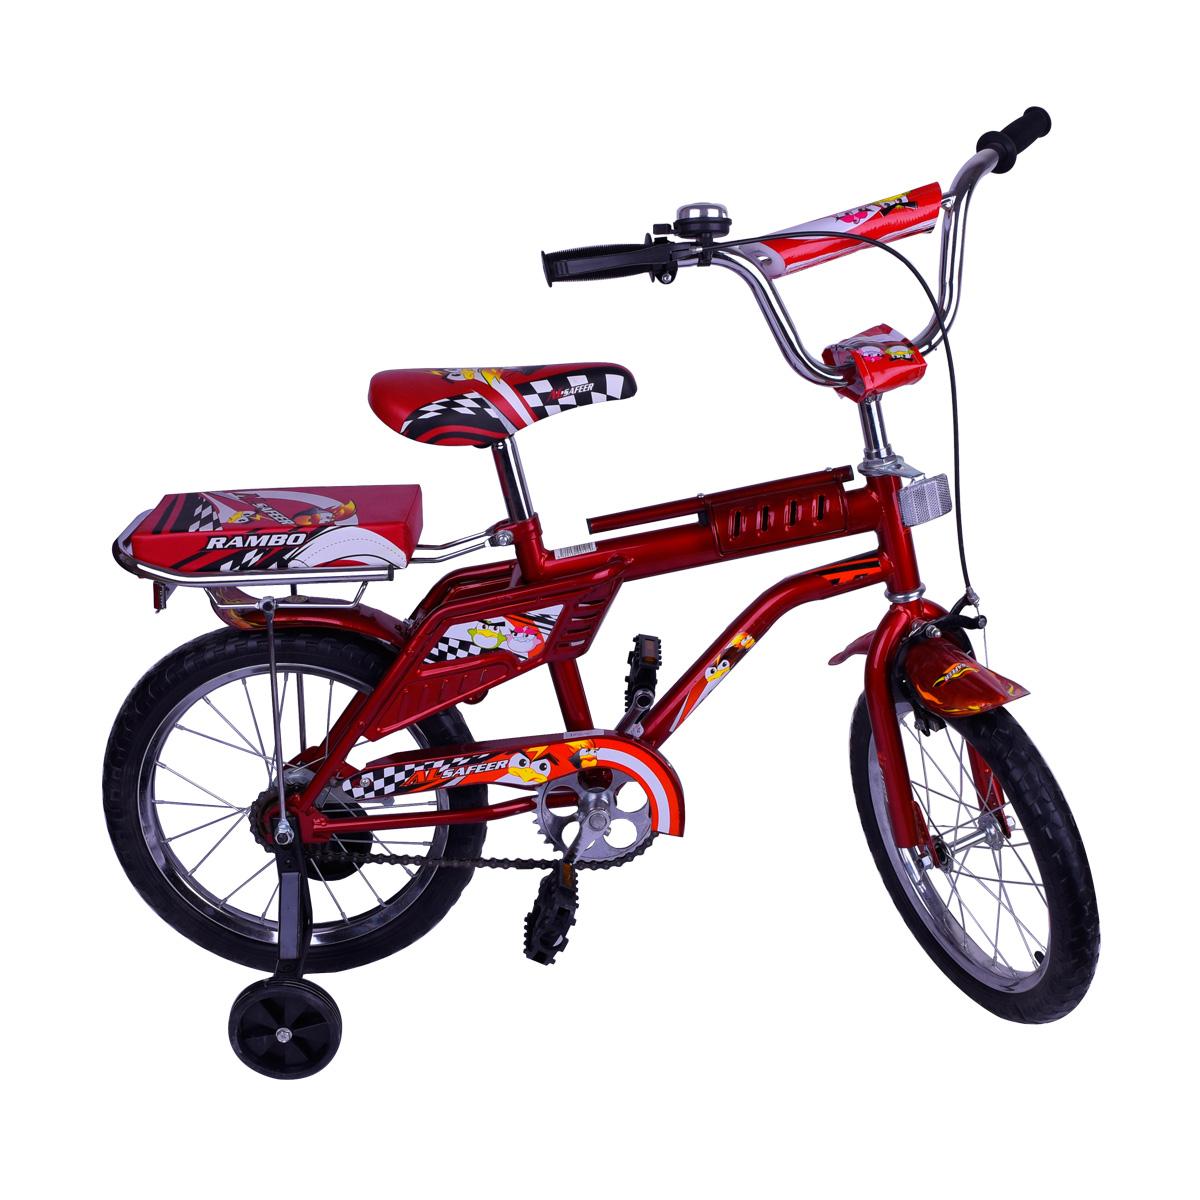 دراجة اطفال رامبو -  مقعدين  -  مقاس 16 إنش - رقم  - EVA16  -  الوان